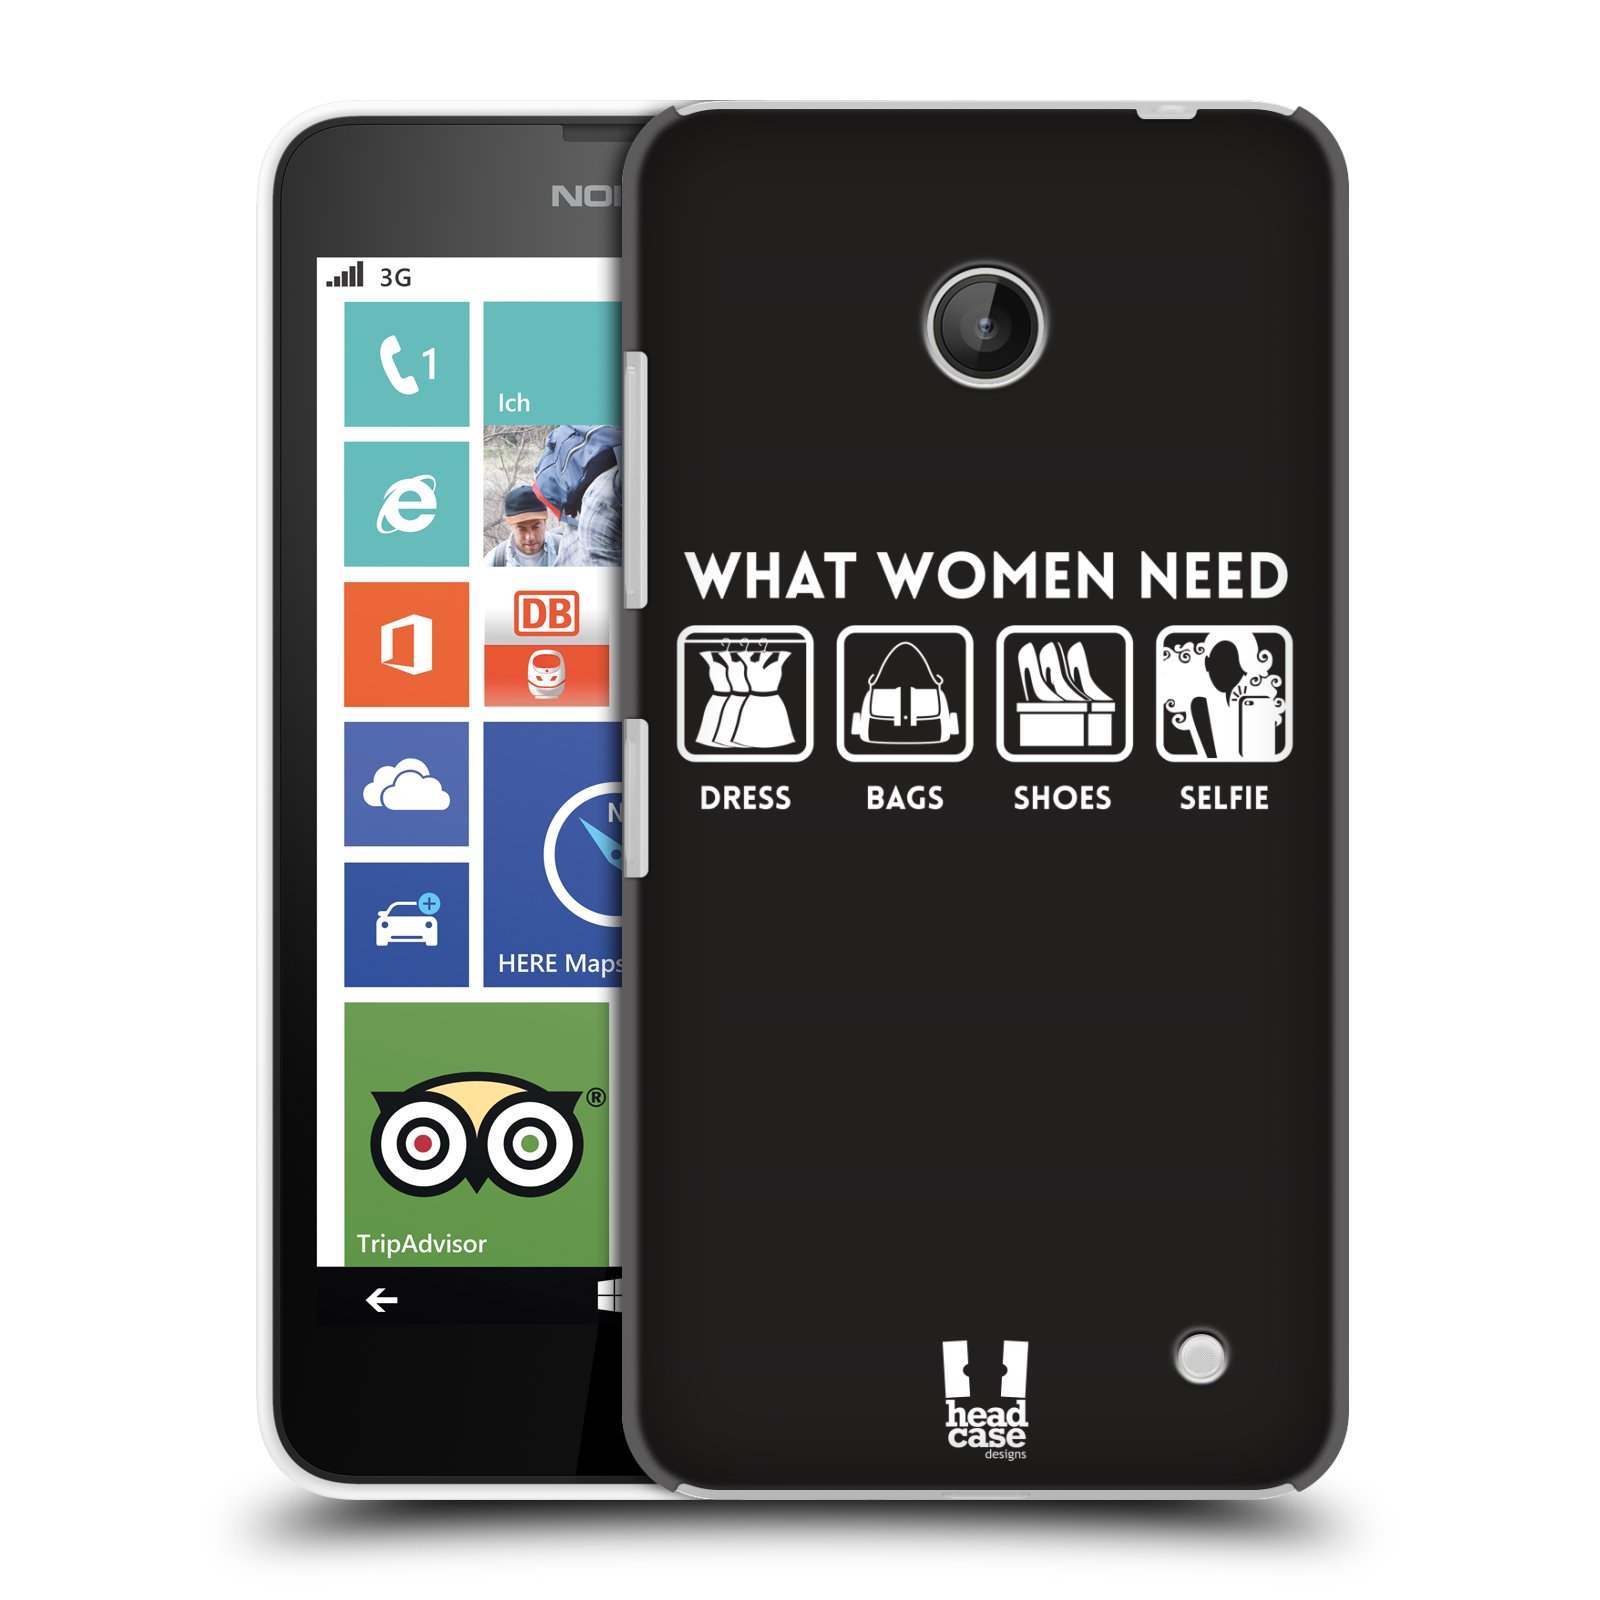 Plastové pouzdro na mobil Nokia Lumia 630 HEAD CASE POTŘEBY ŽENY (Kryt či obal na mobilní telefon Nokia Lumia 630 a Nokia Lumia 630 Dual SIM)